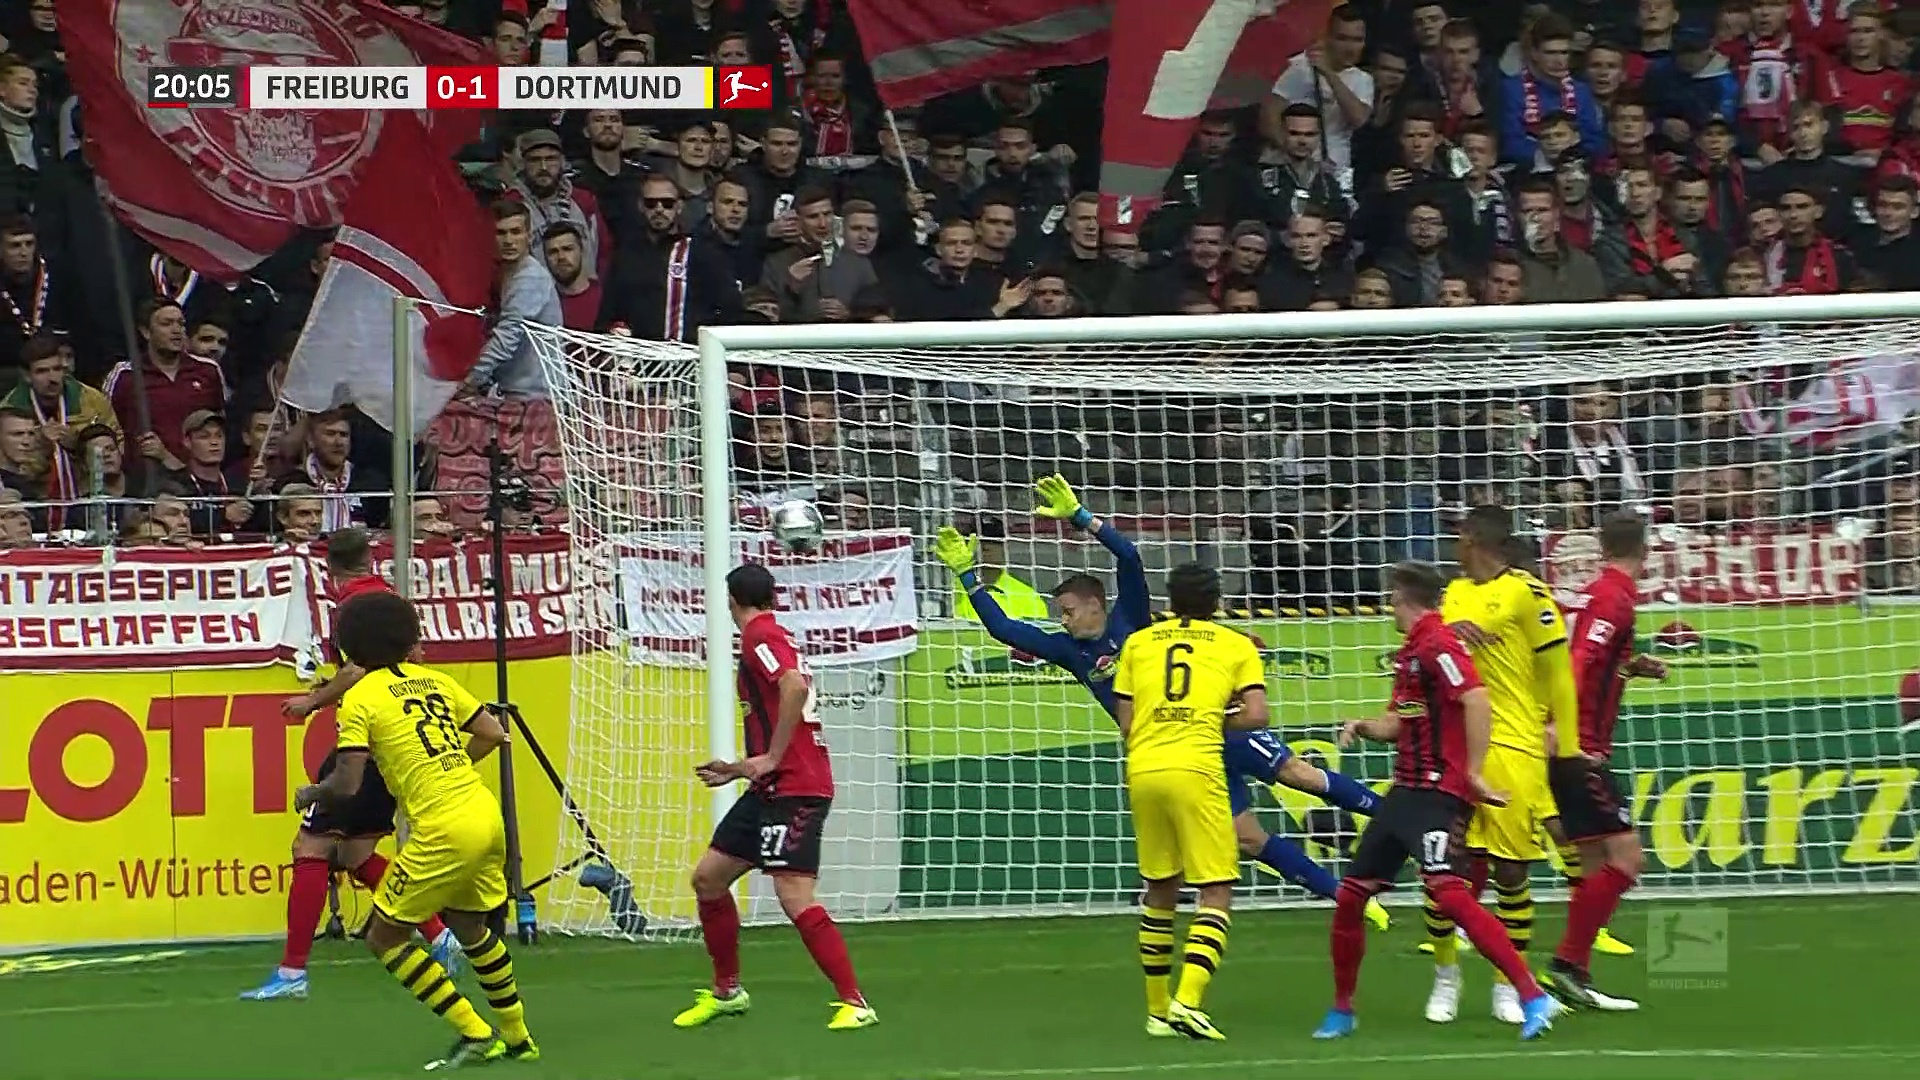 7. Hafta / Freiburg - Borussia Dortmund: 2-2 (Özet)